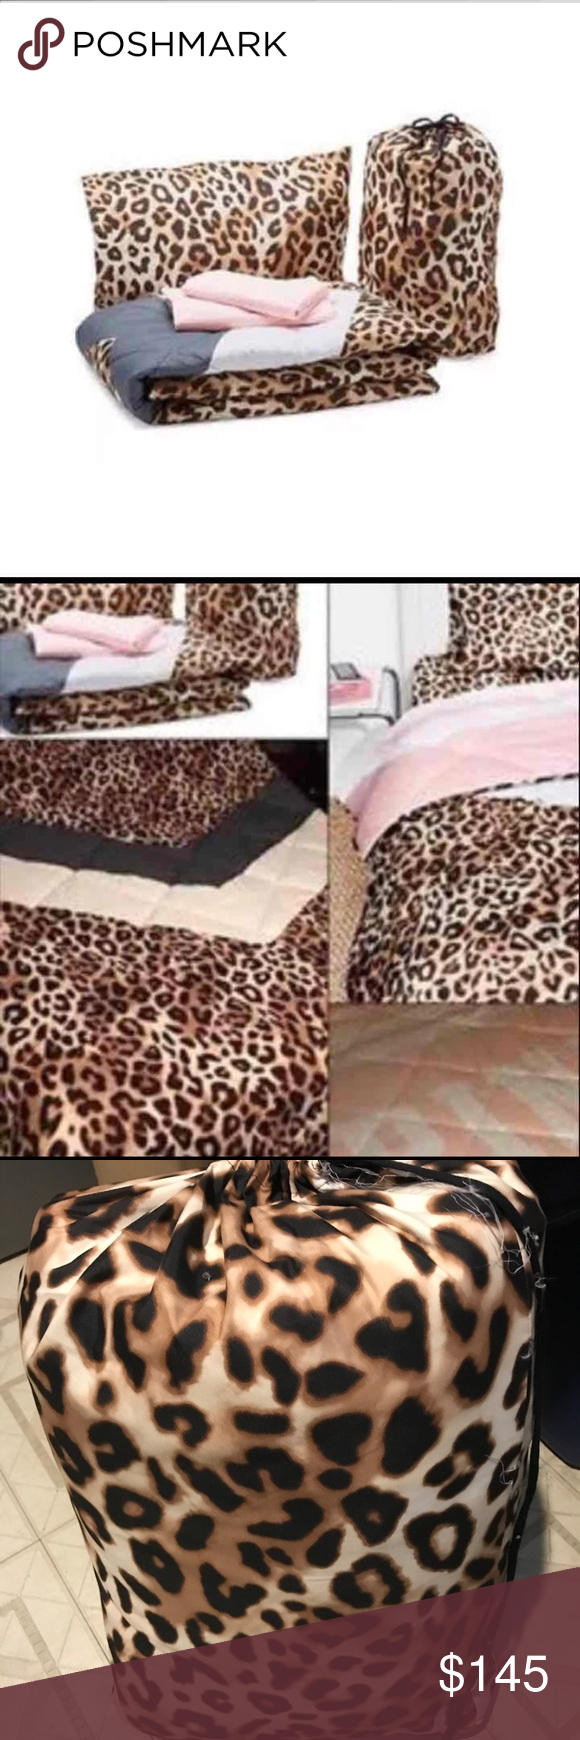 Vs pink bedding sets - Vs Pink Bedding Sets